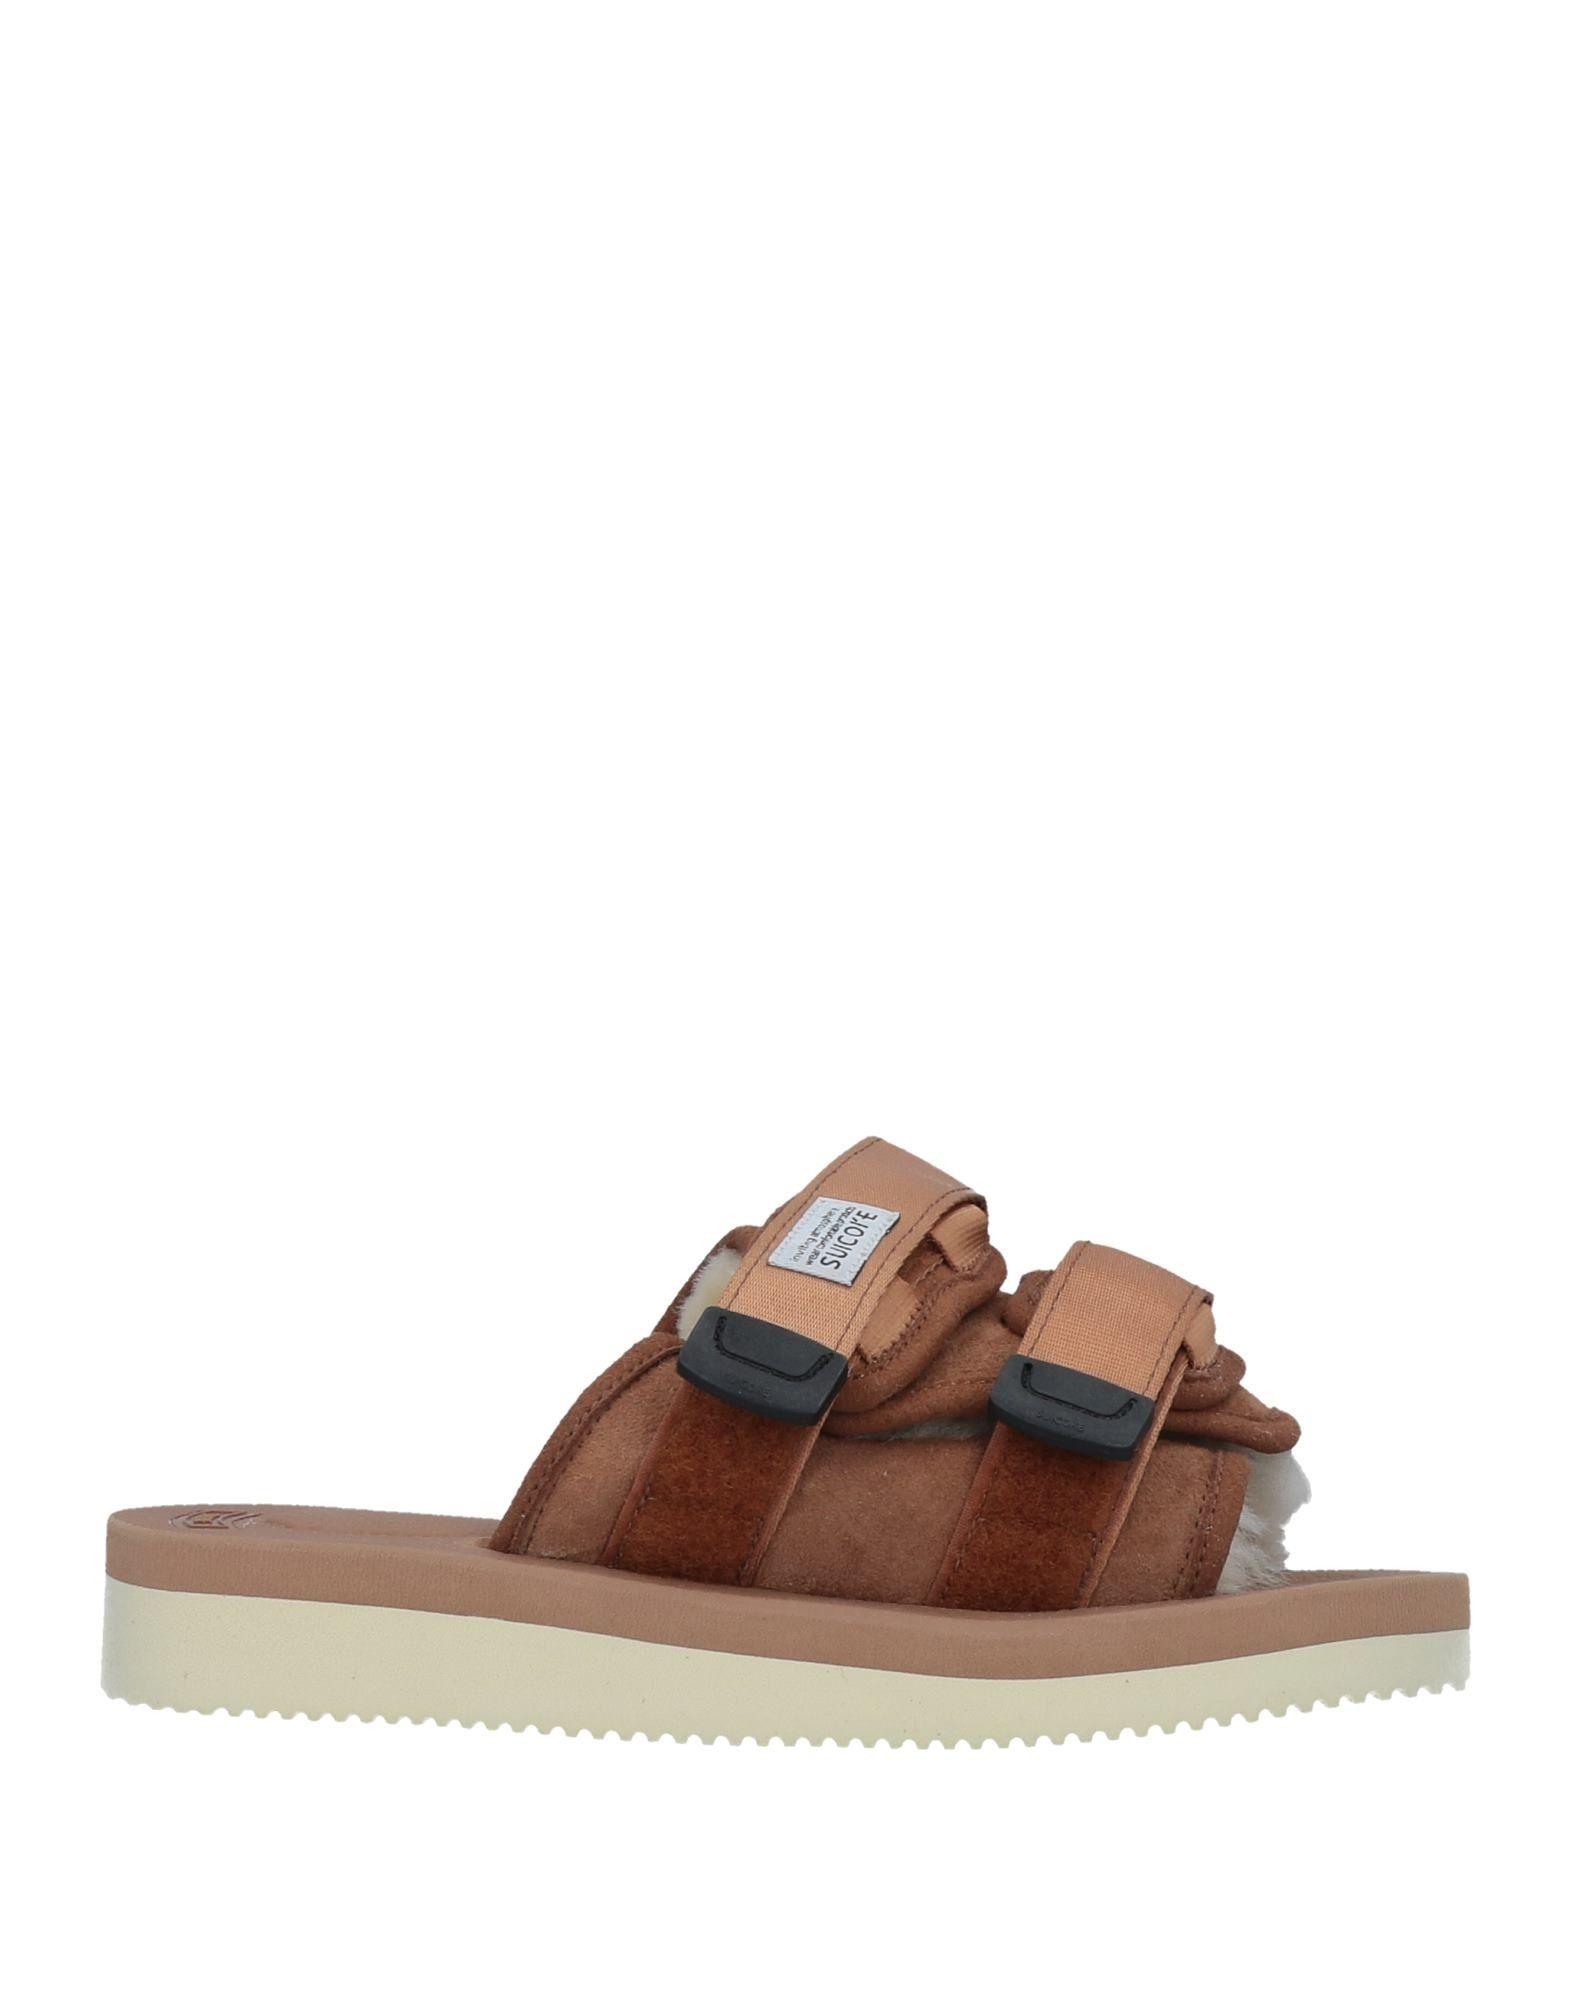 Suicoke Sandalen Herren  11502477TF Gute Qualität beliebte Schuhe